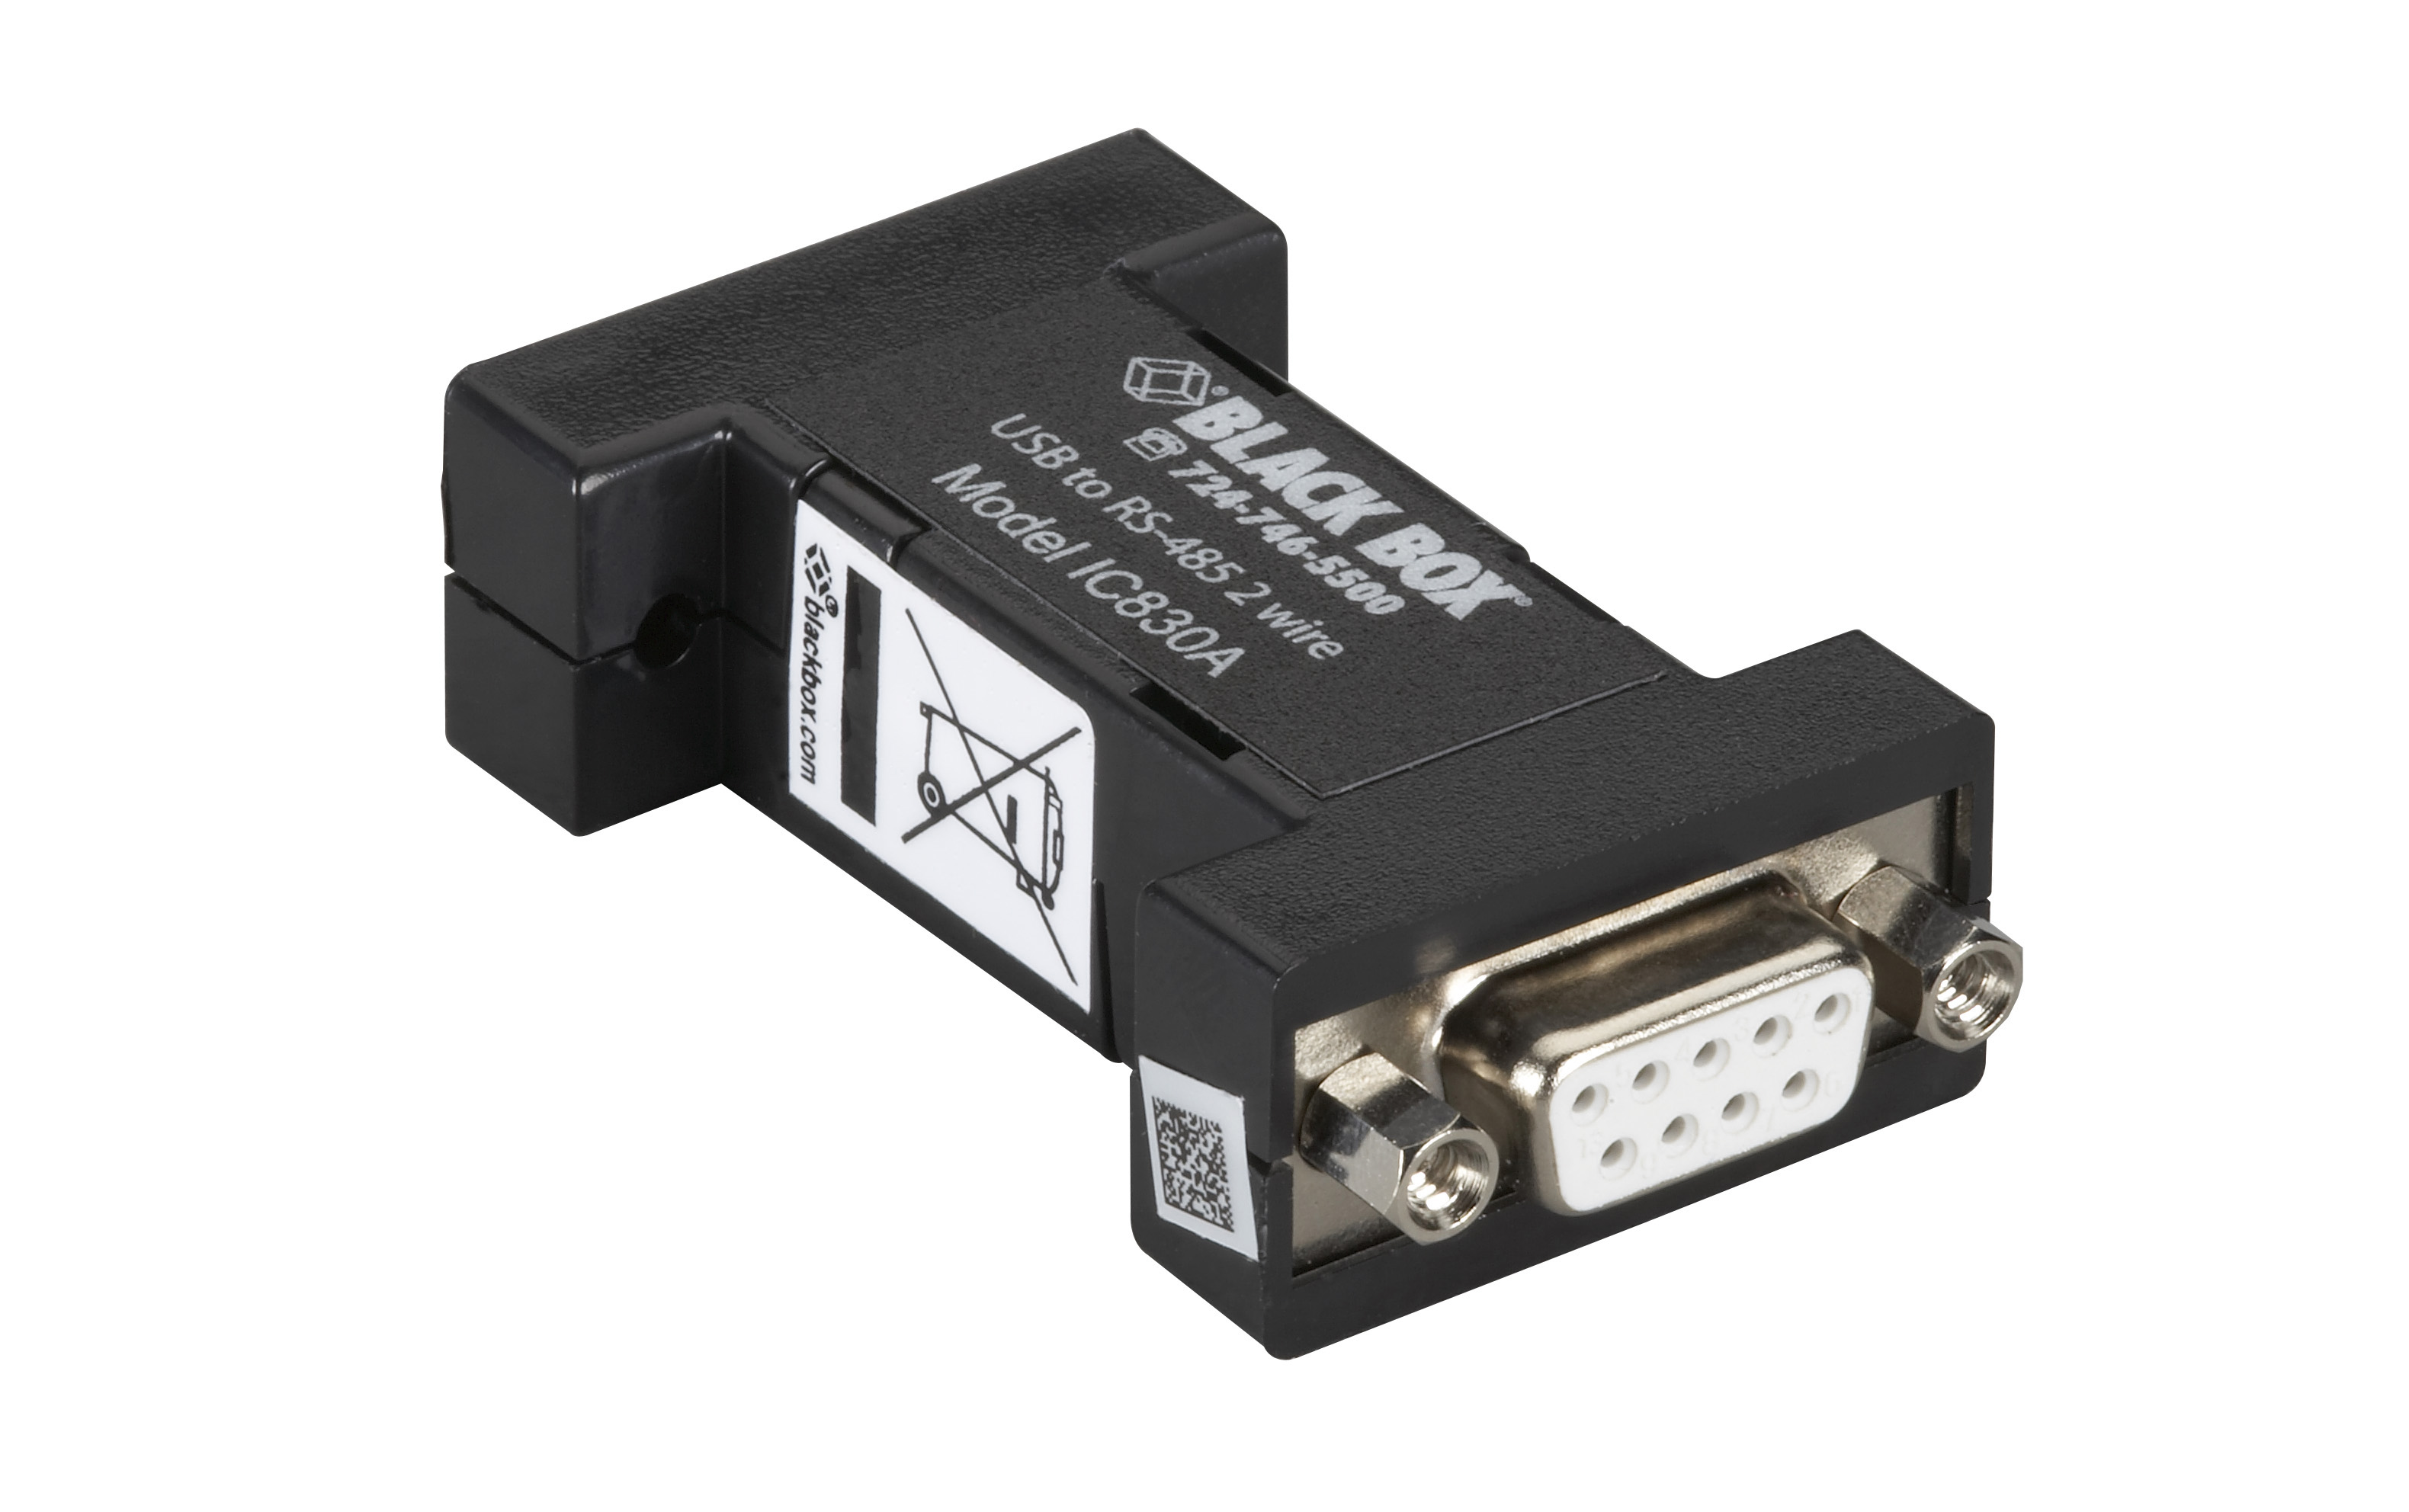 rs485 to usb converter circuit diagram mitsubishi pajero io wiring rs232 2 wire somurich